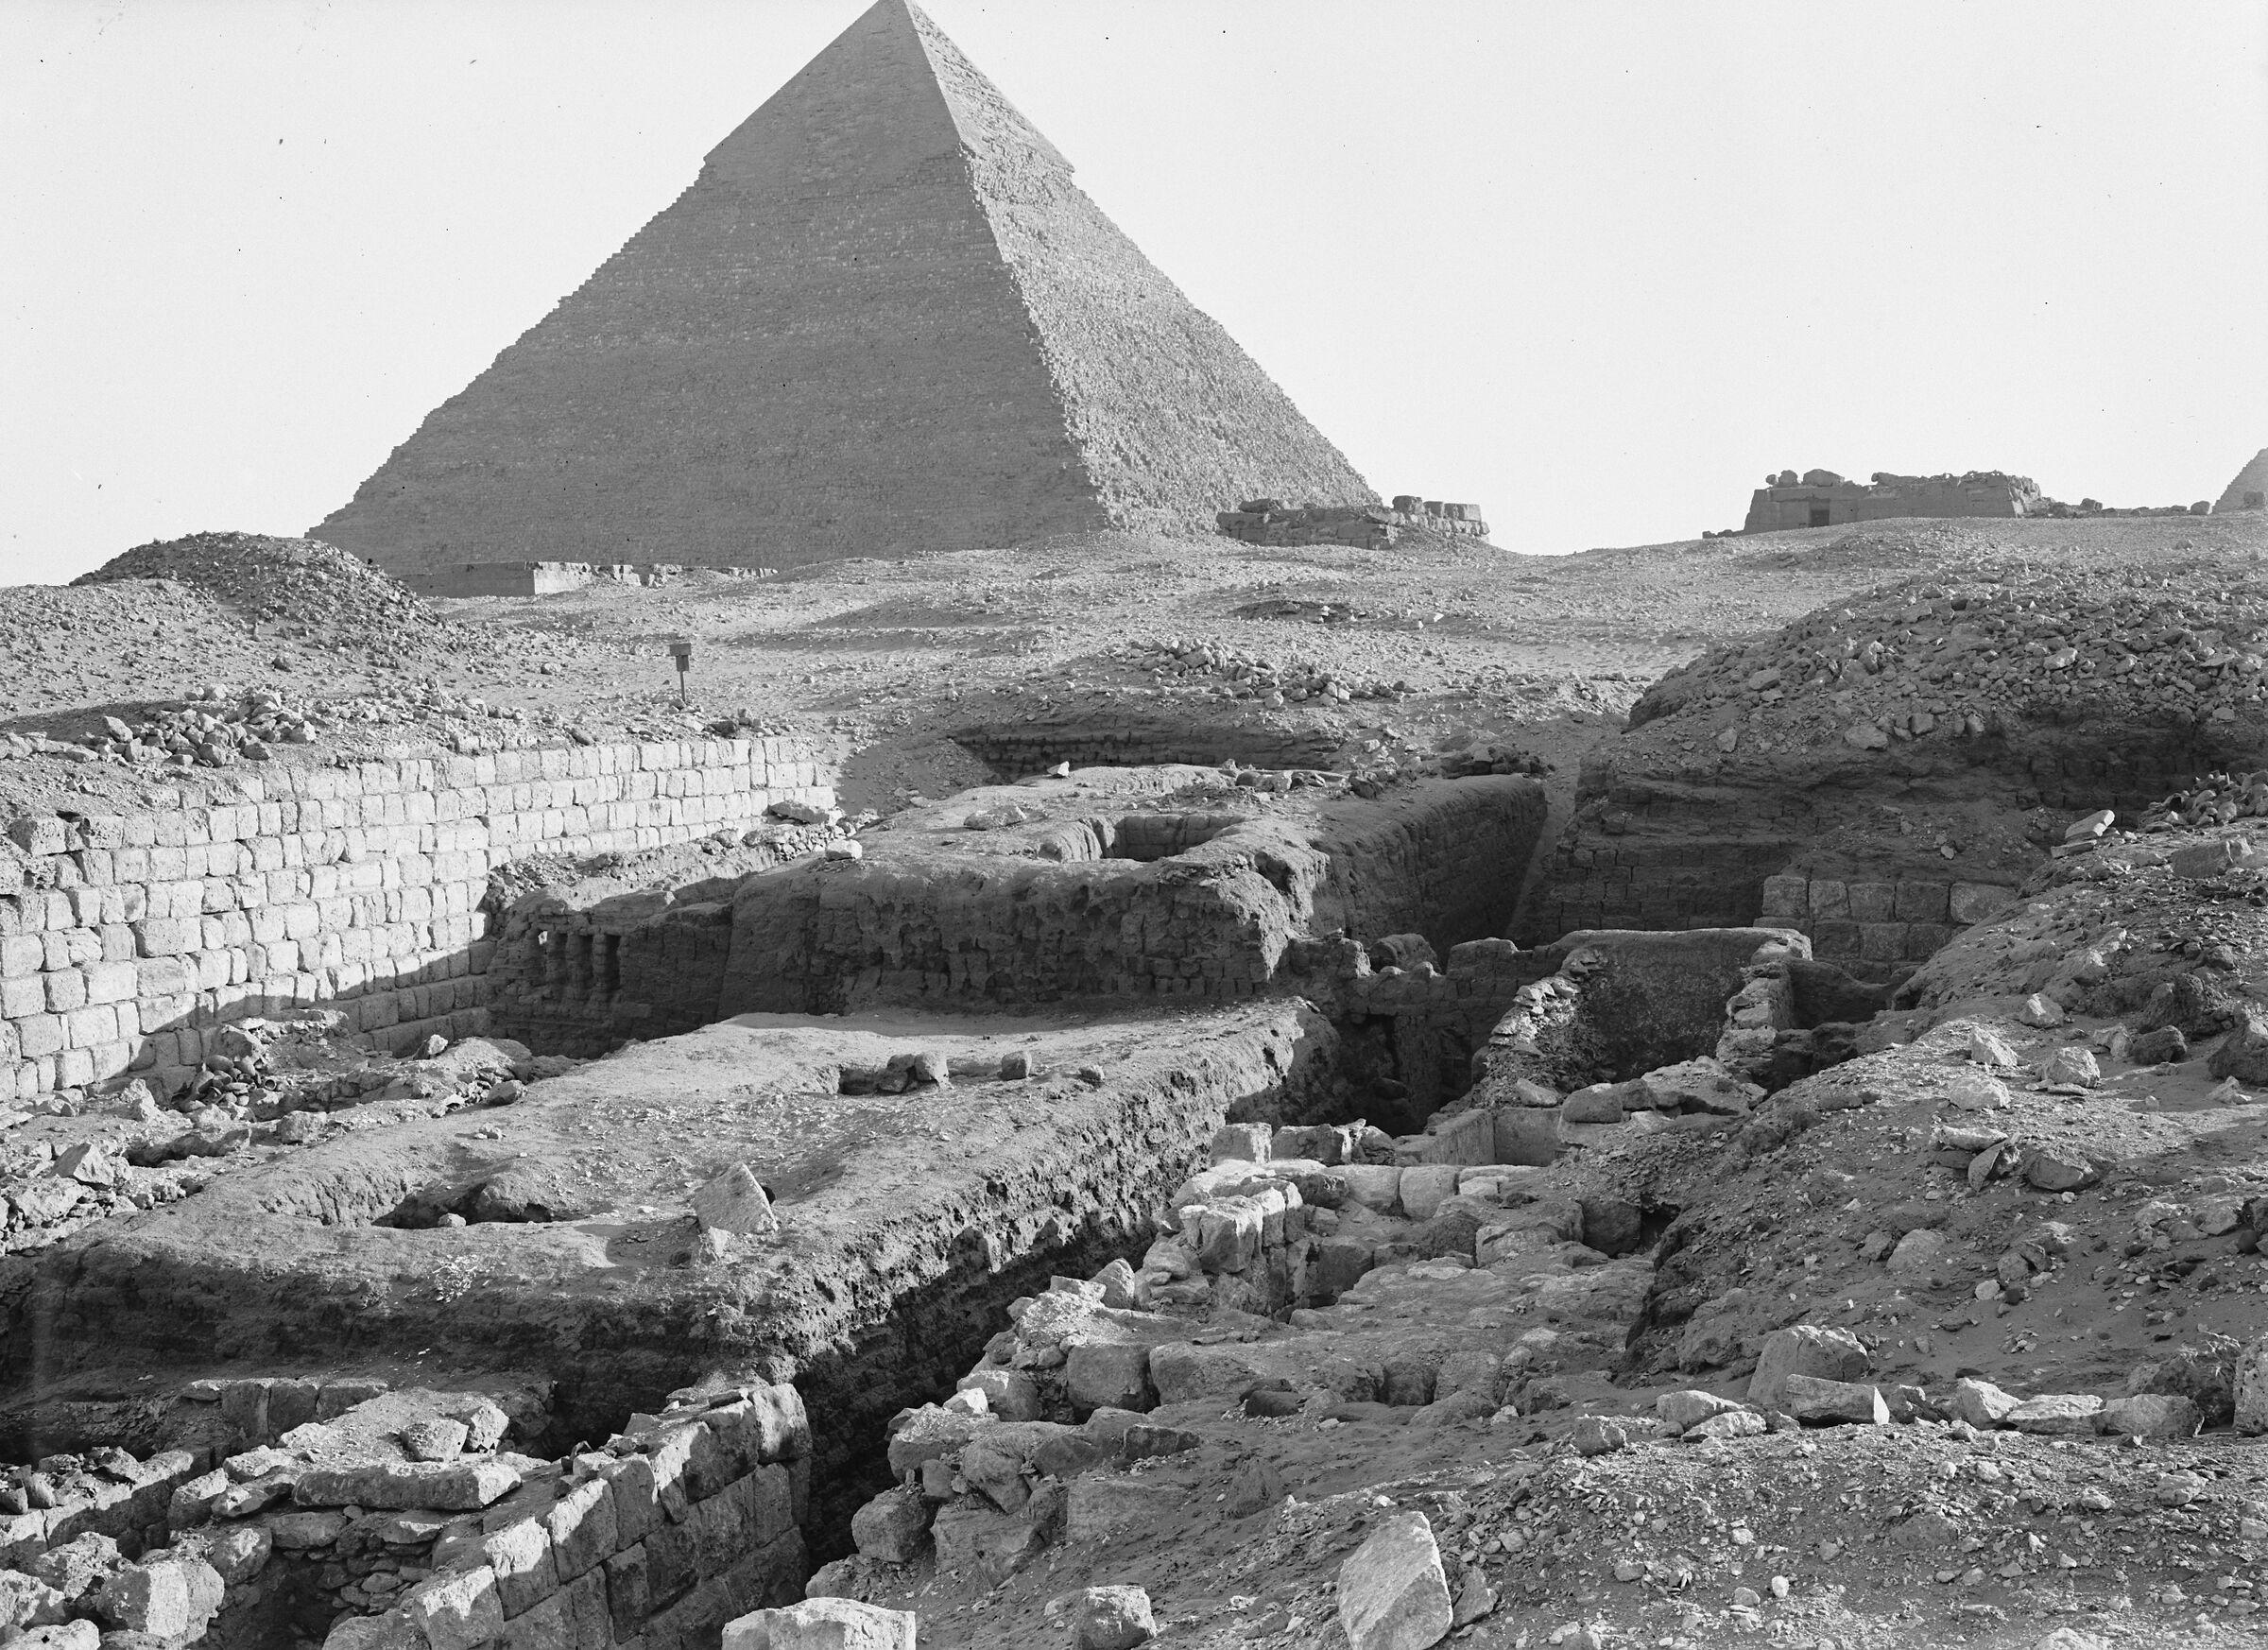 Western Cemetery: Site: Giza; View: G 1404, G 1406, G 1413, G 1411, G 1412, G 1403, G 1209